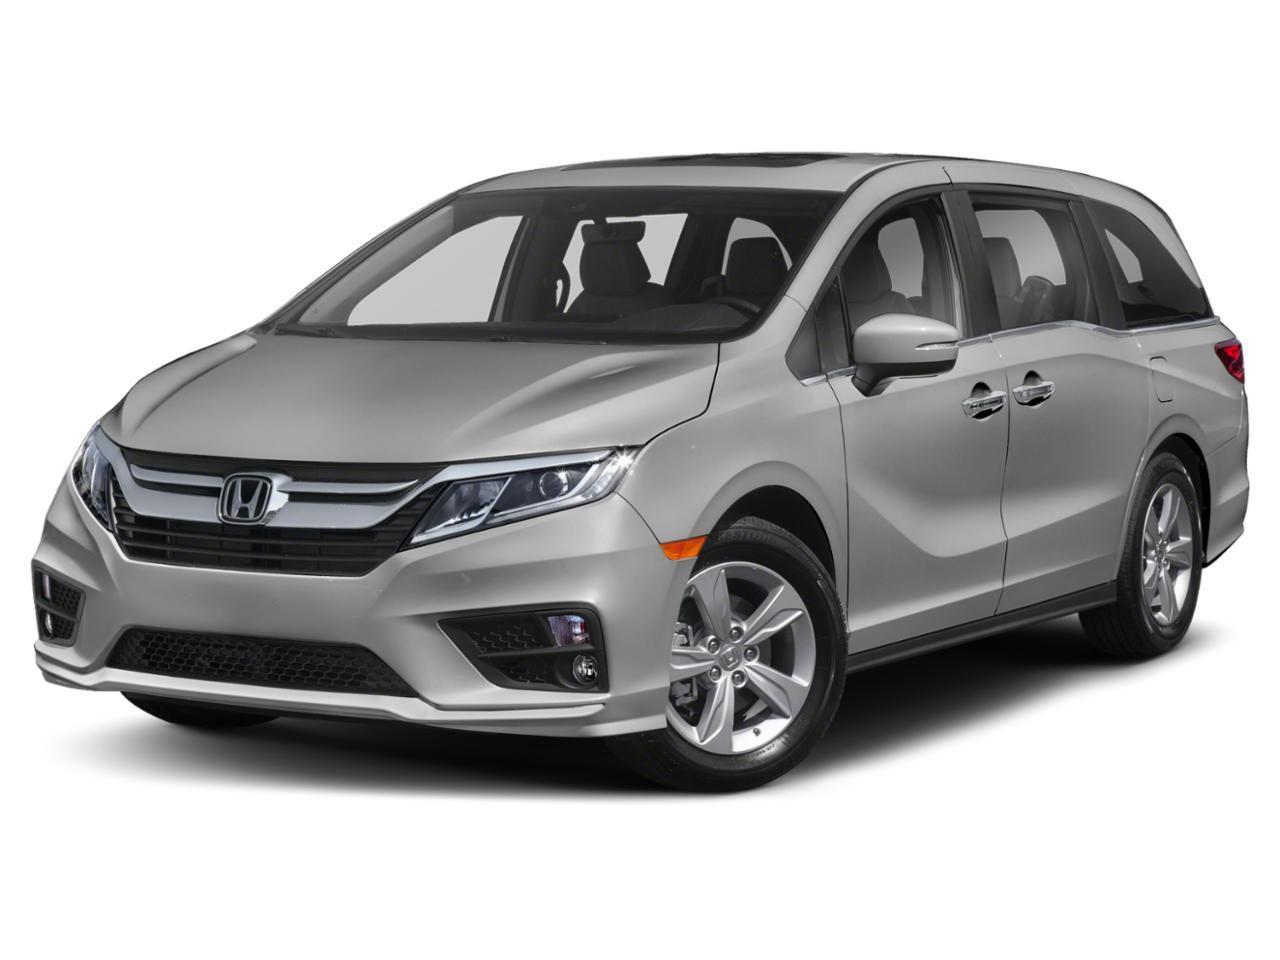 2019 Honda Odyssey Vehicle Photo in San Antonio, TX 78238